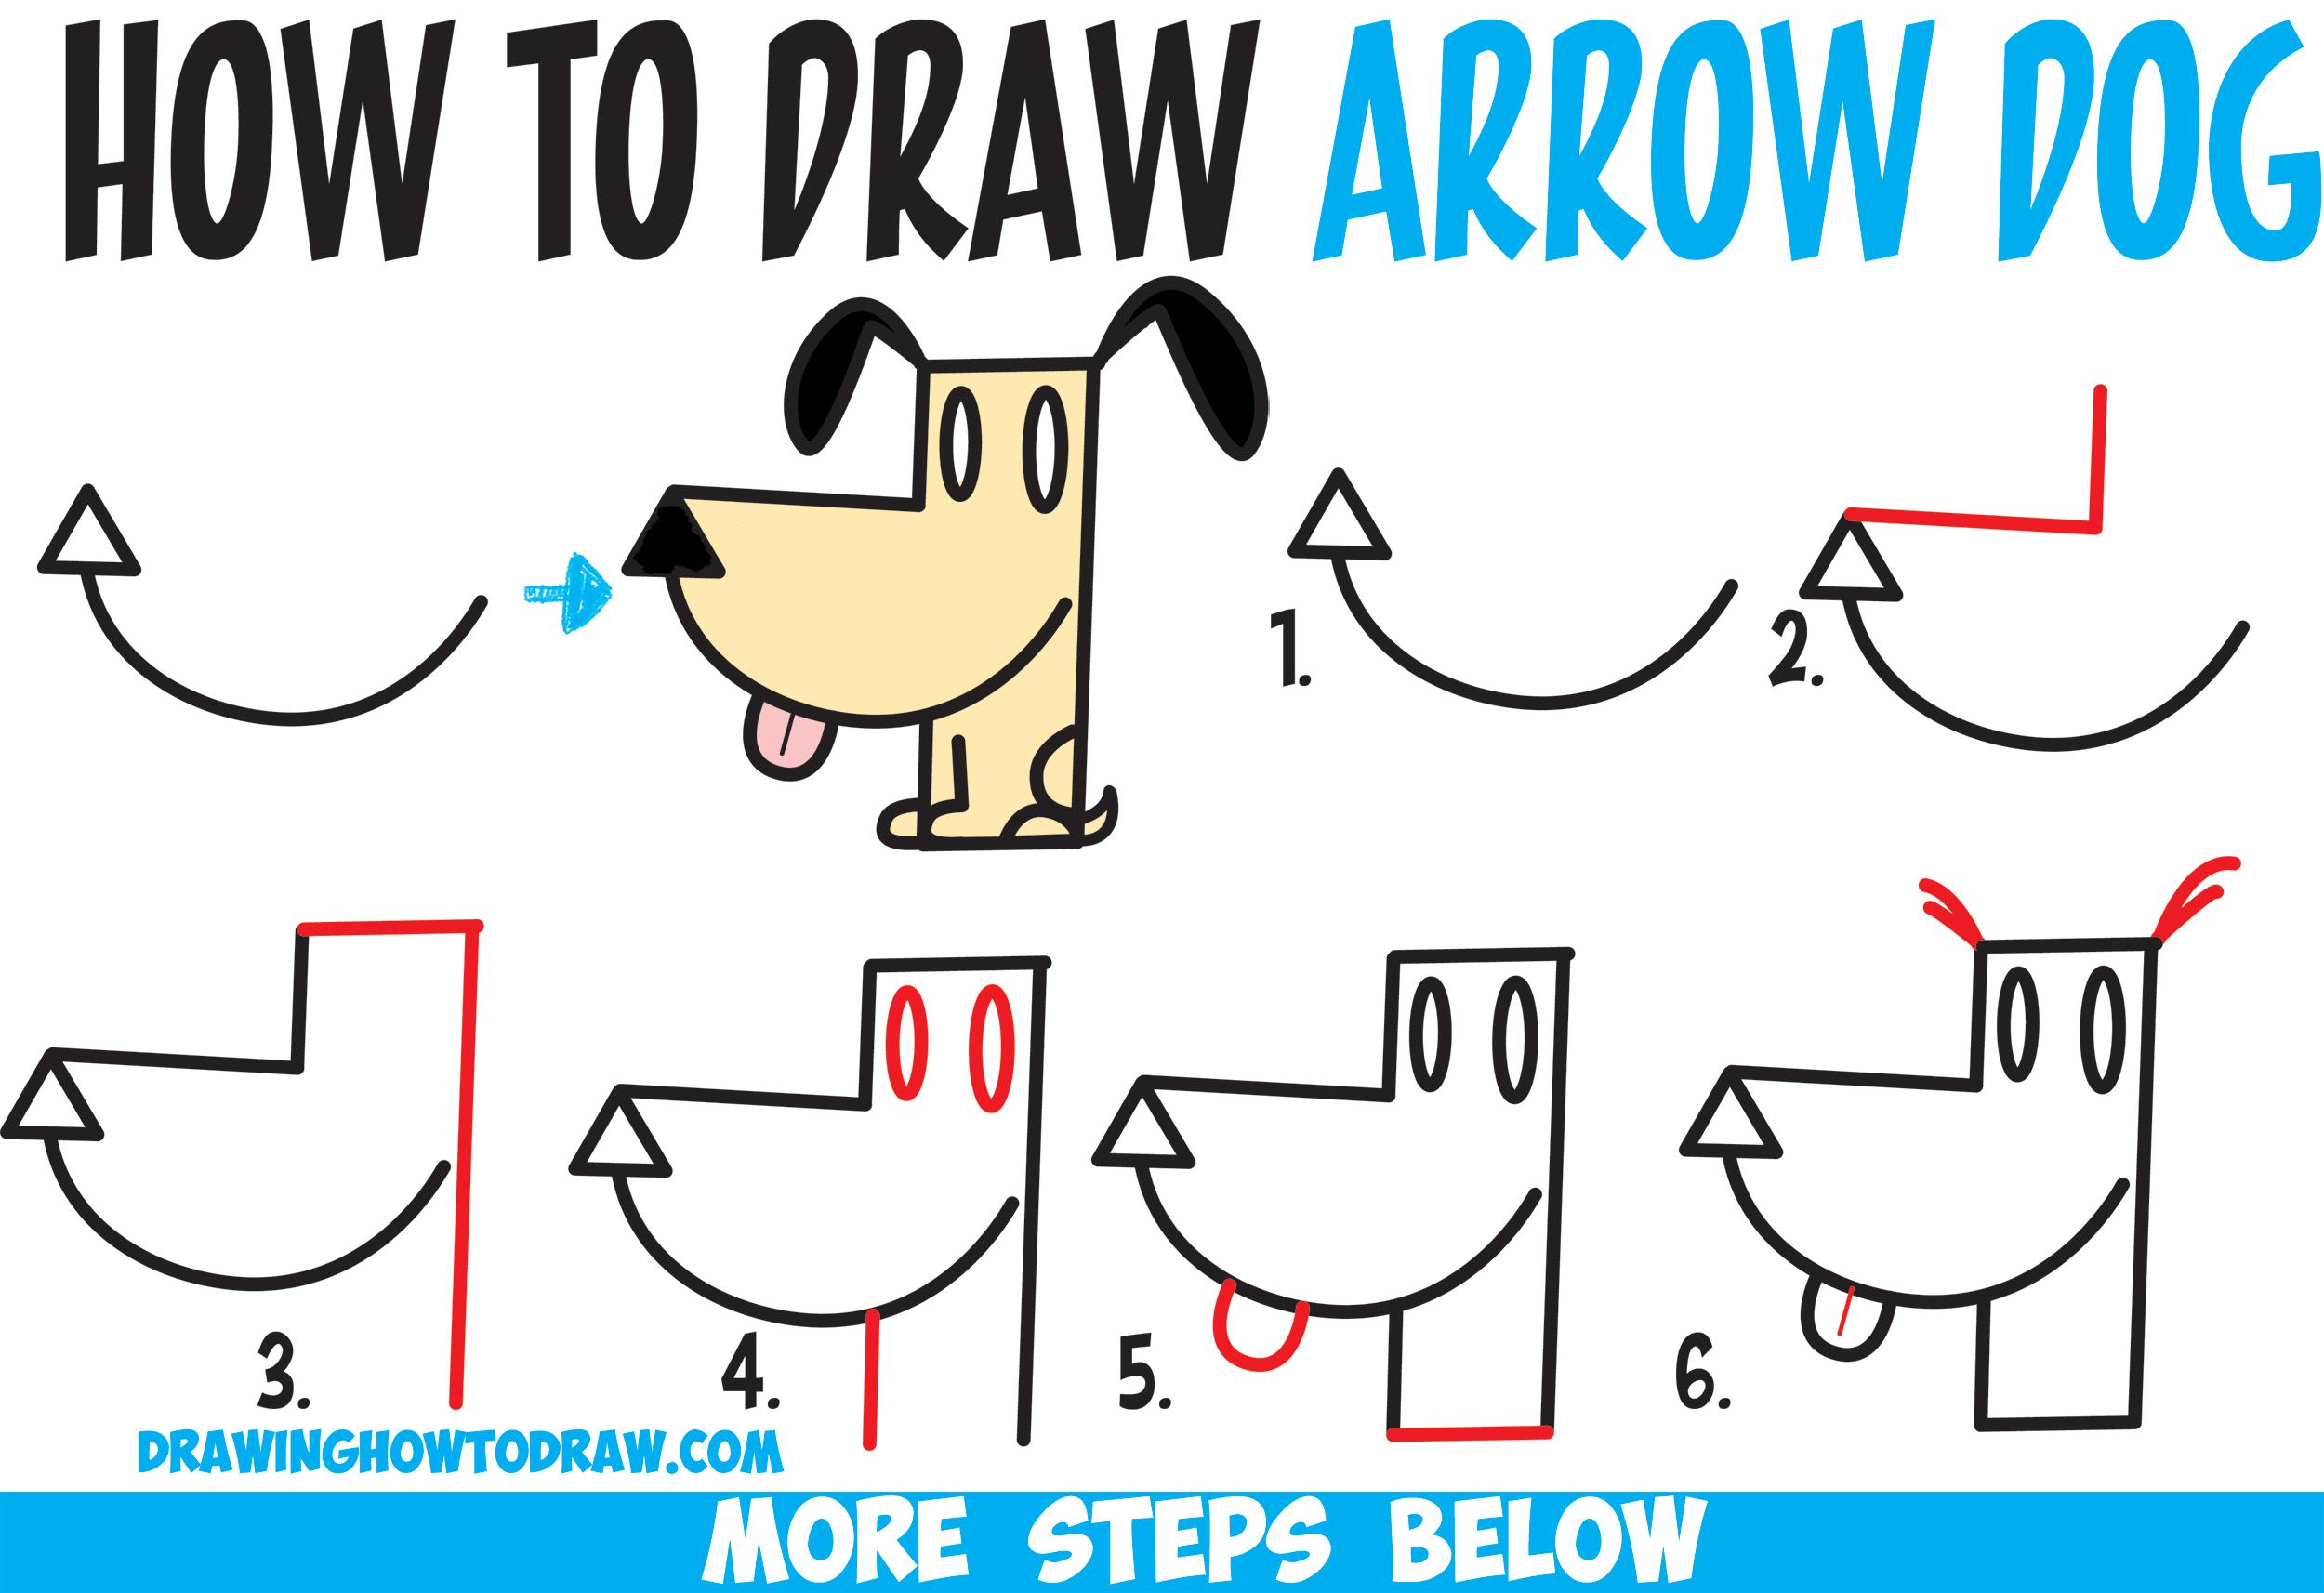 2500x1714 How To Draw A Cartoon Dog From An Arrow Shape